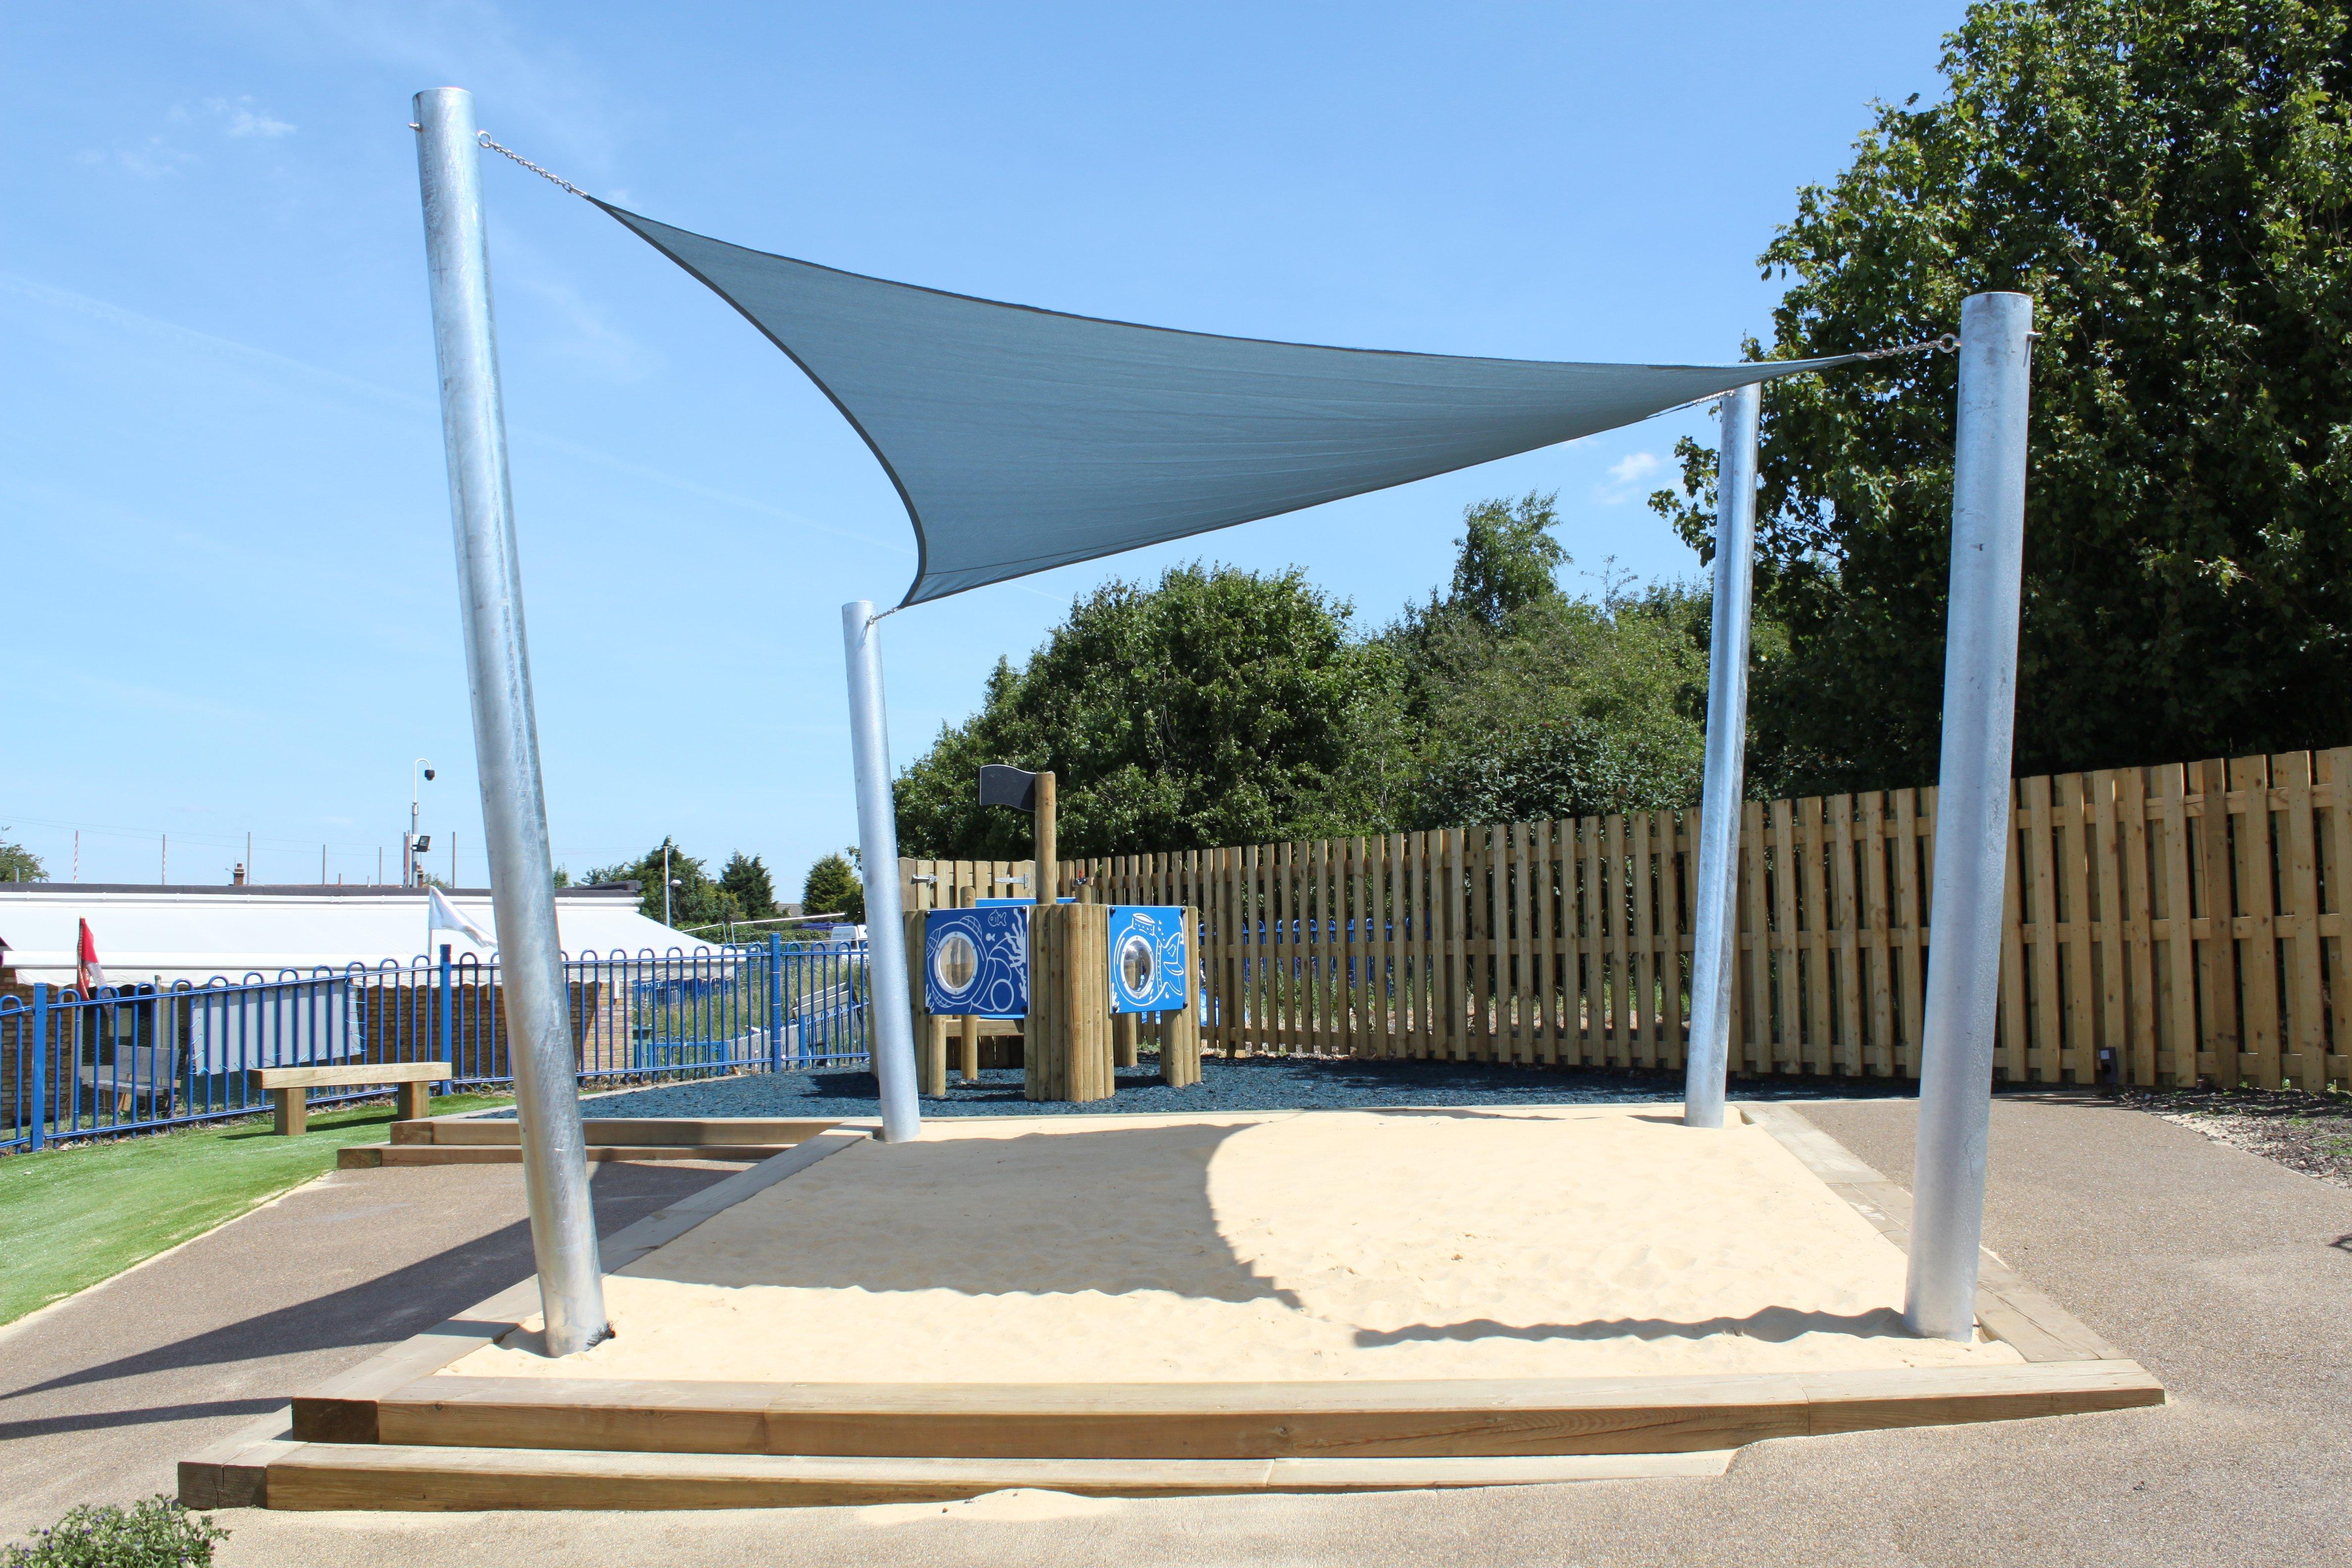 Sand and Water Play, Playground